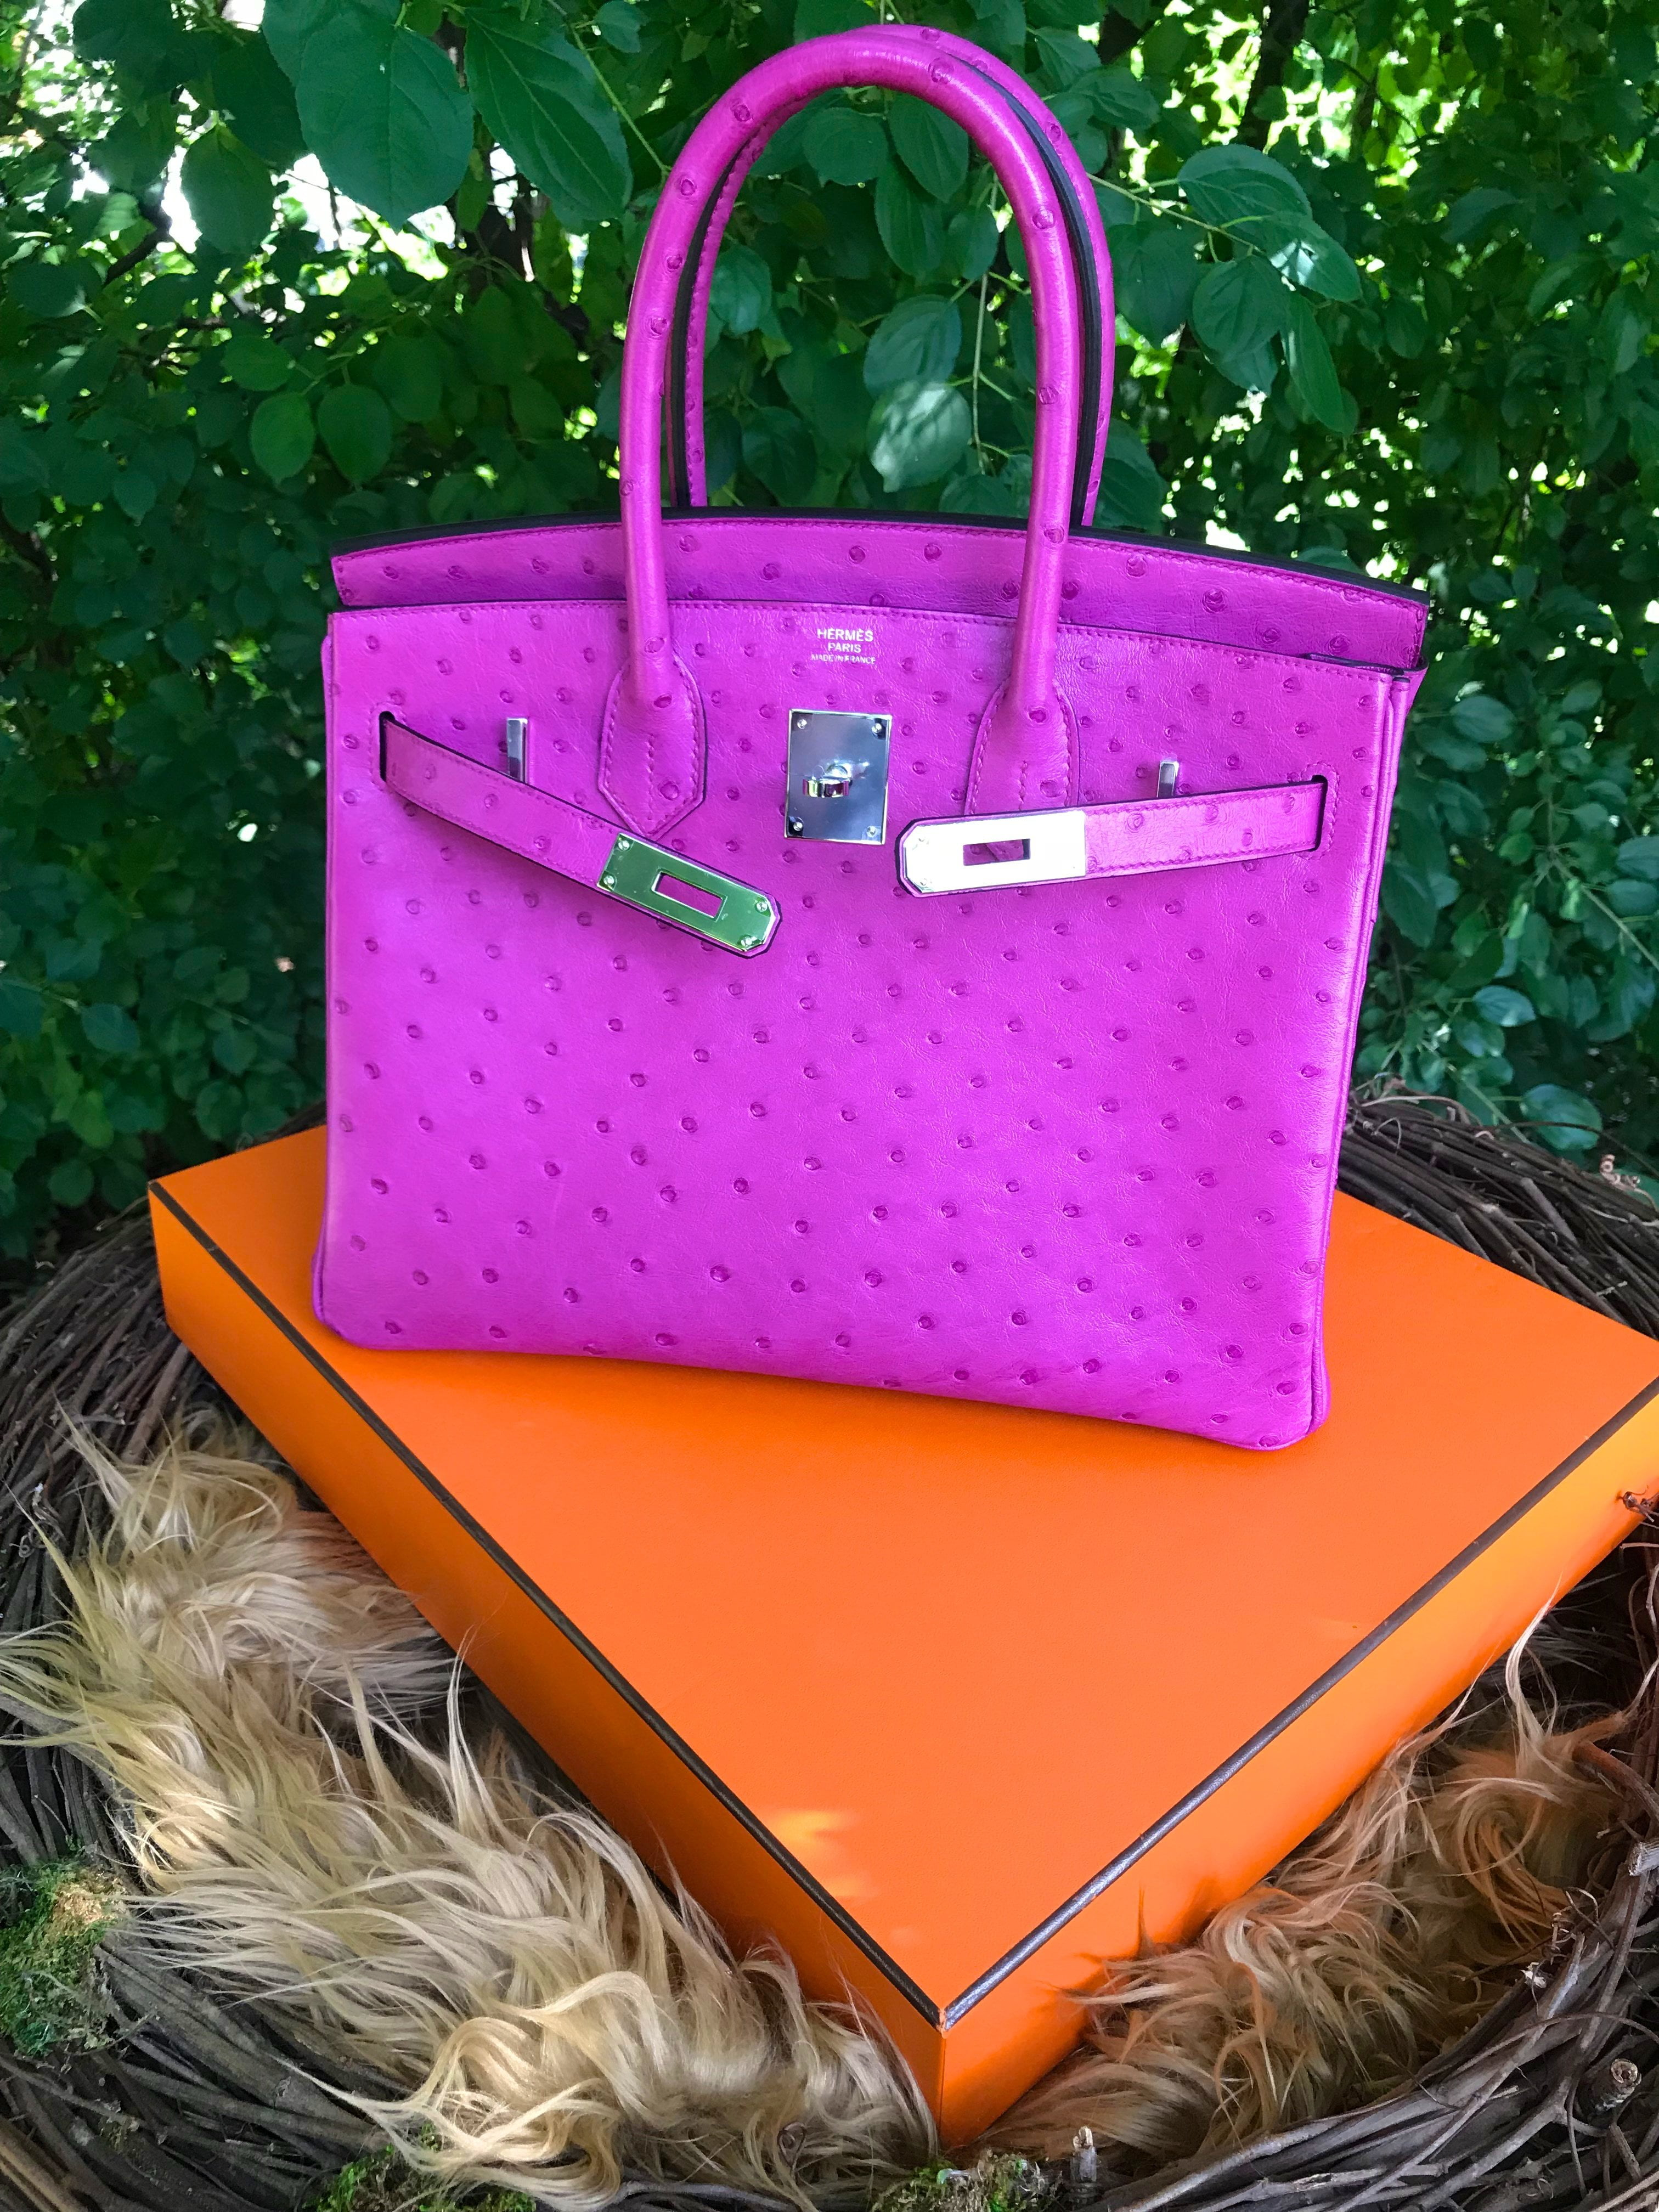 c957b1c8bba Hermes Rose Pourpre Ostrich birkin 30 pursebop birthday baggie hermes fsh  hermes ostrich